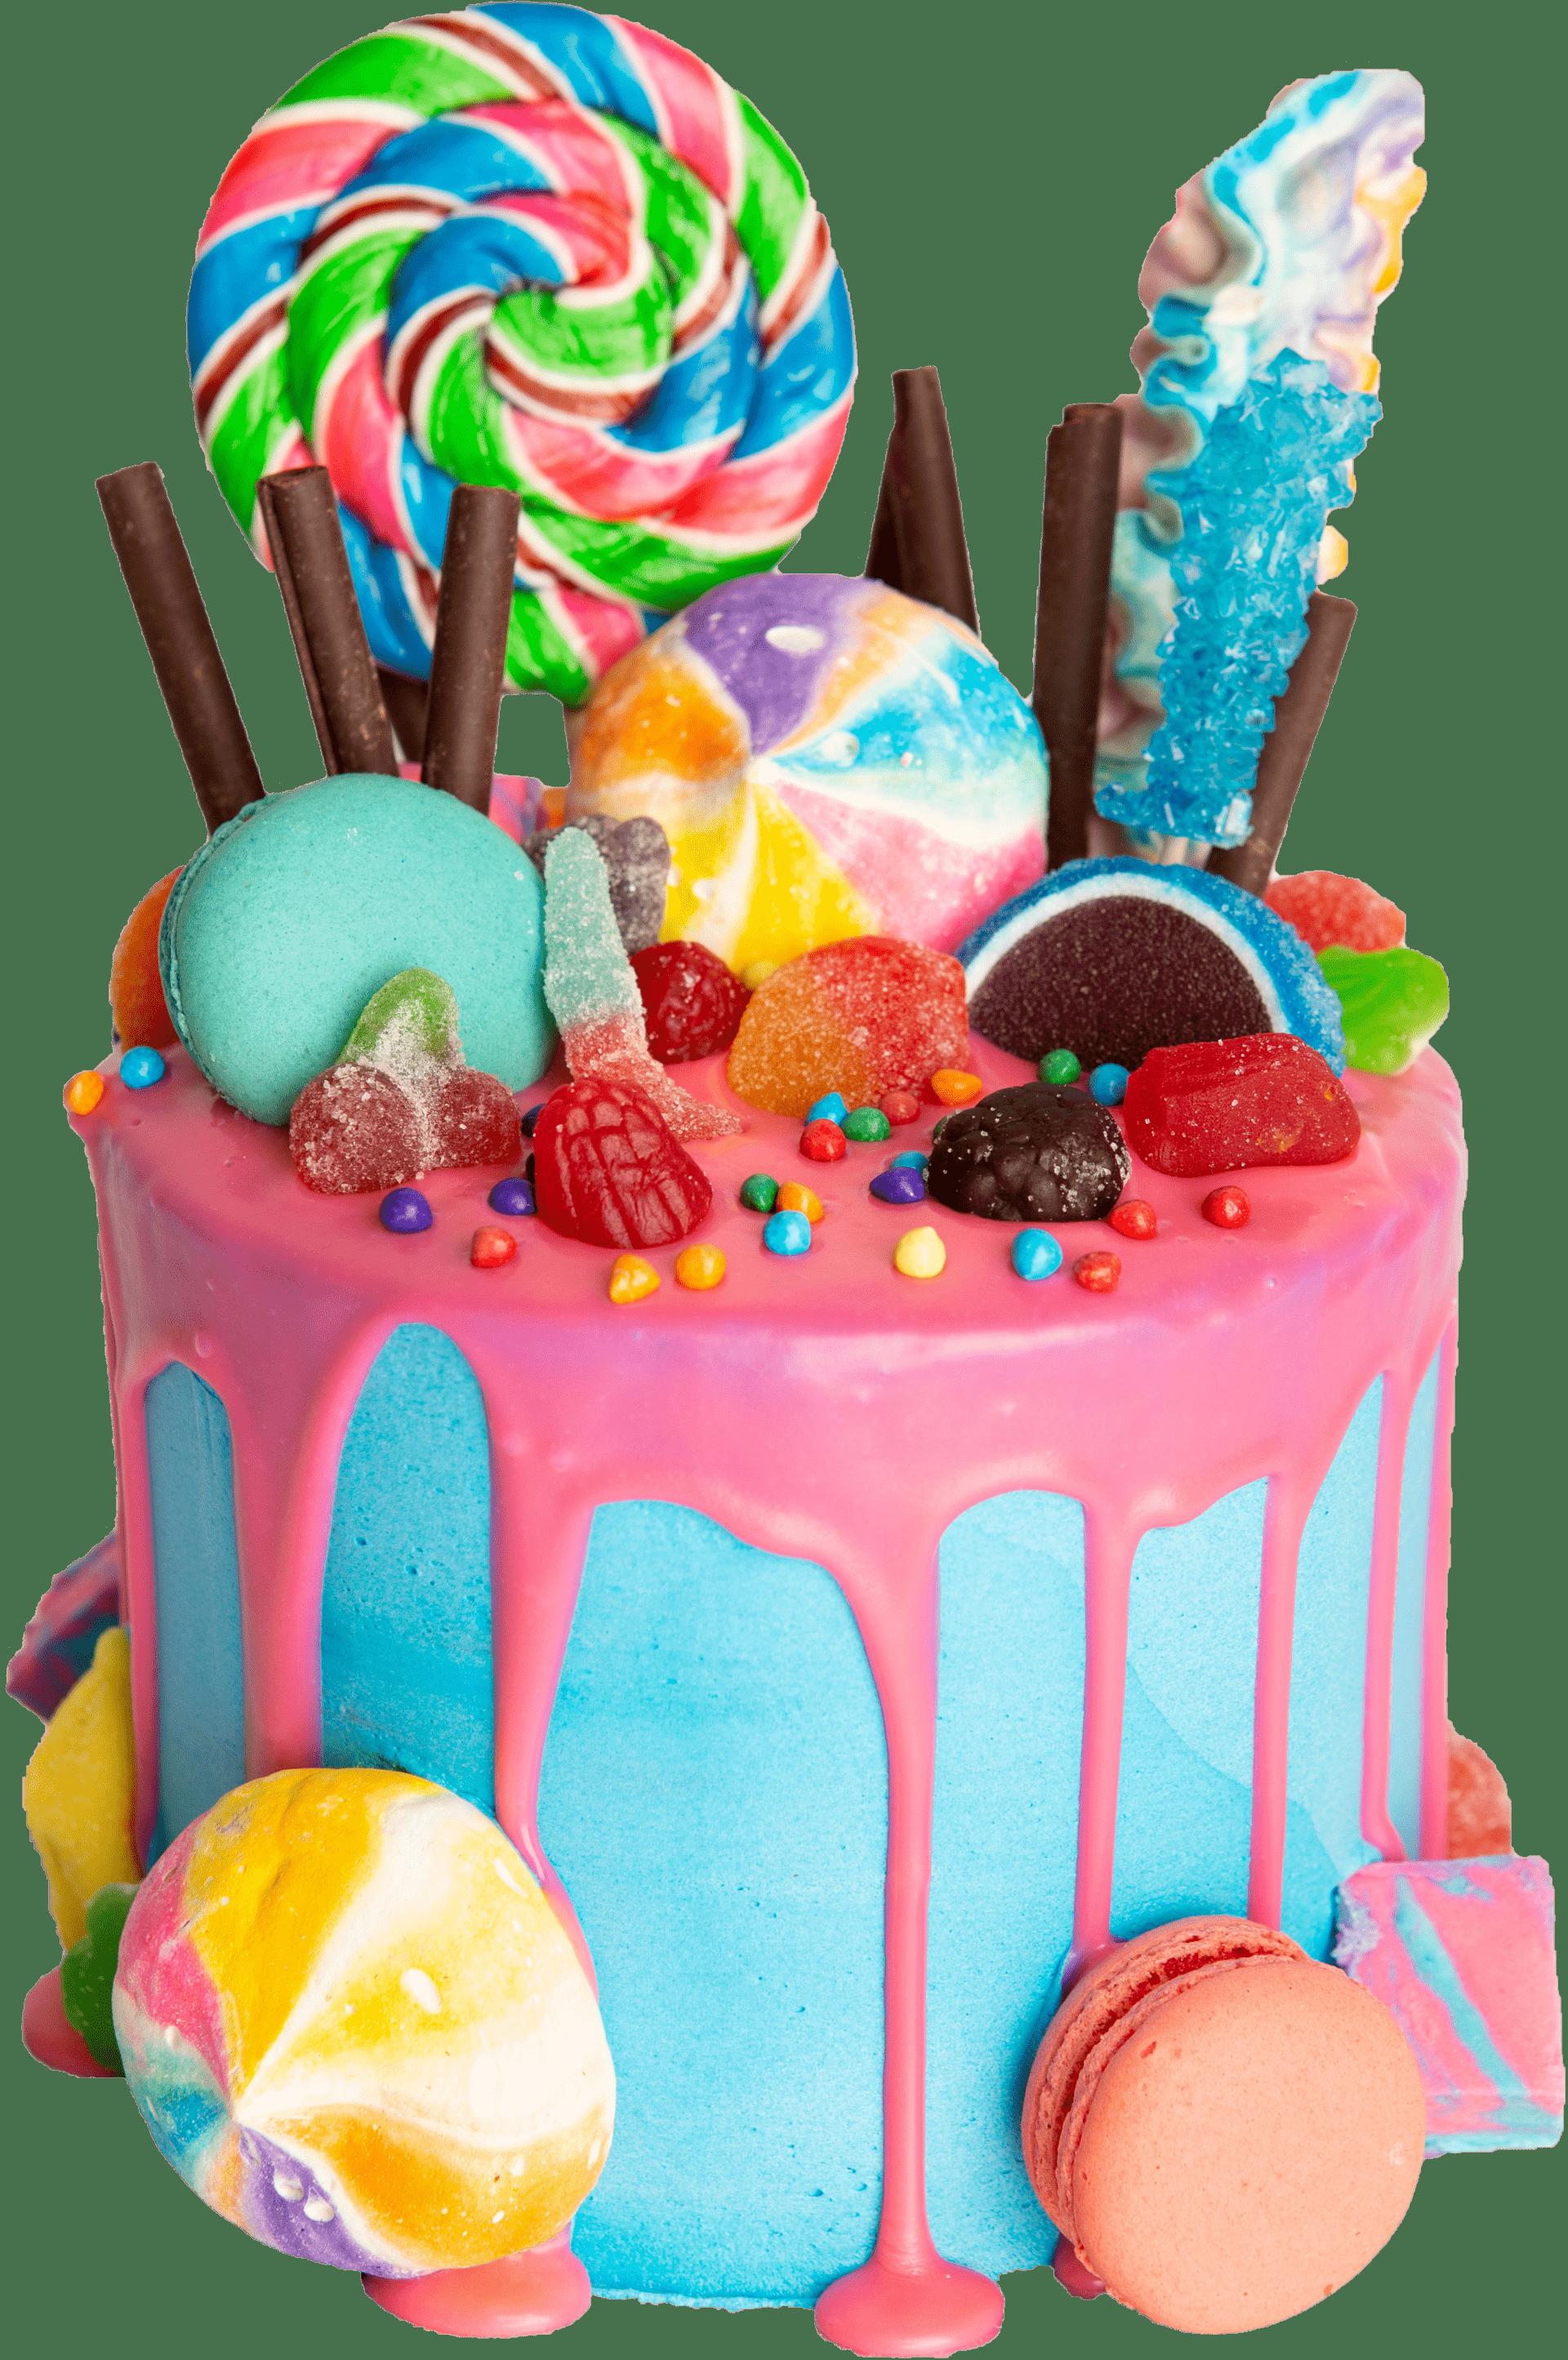 Le Dripcake festif